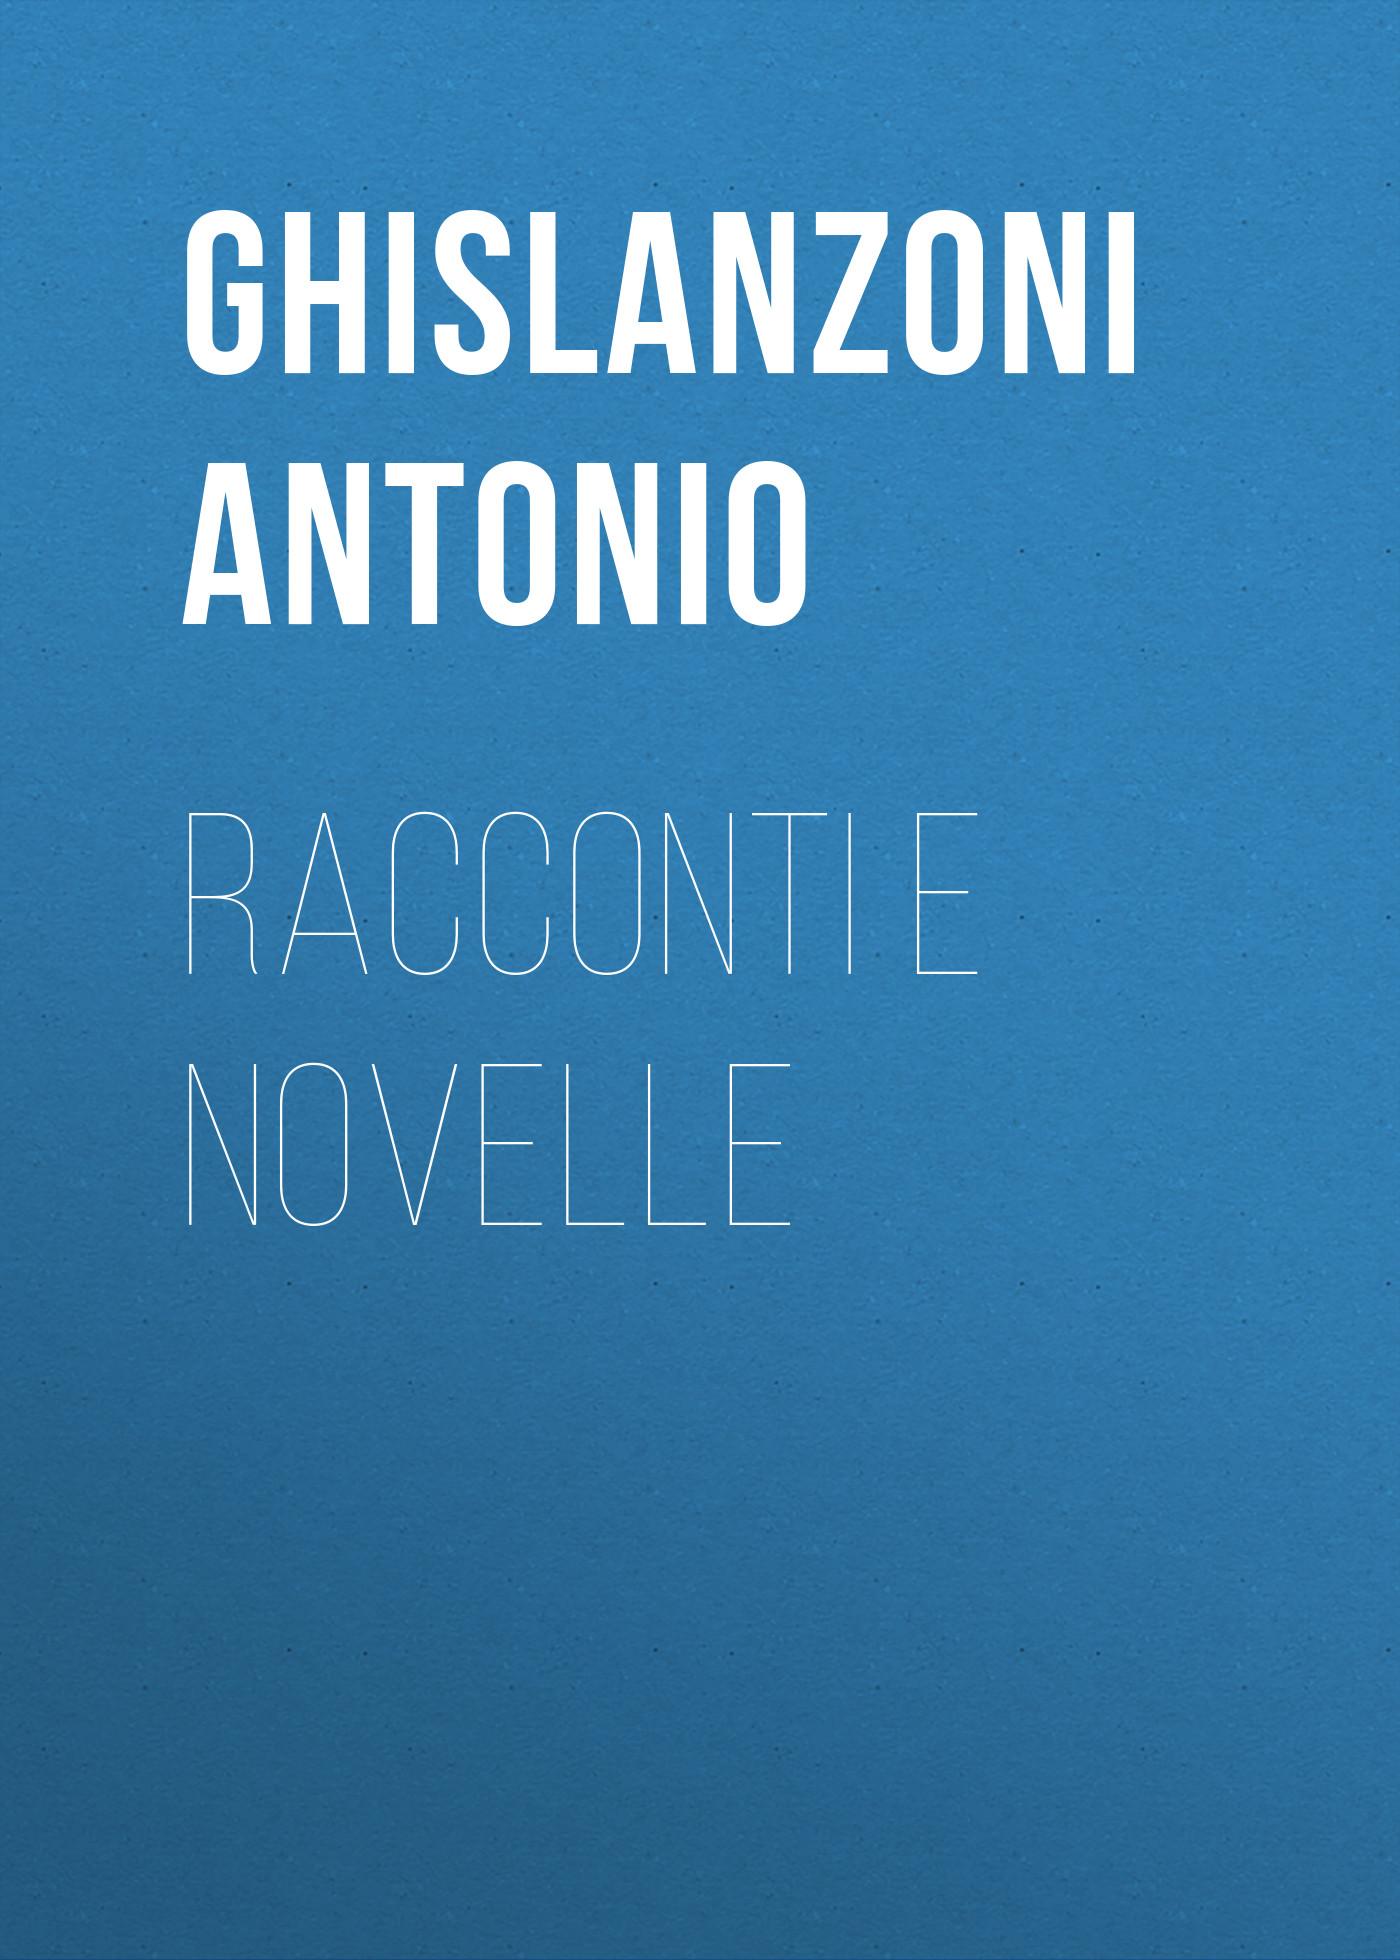 Ghislanzoni Antonio Racconti e novelle ghislanzoni antonio libro segreto